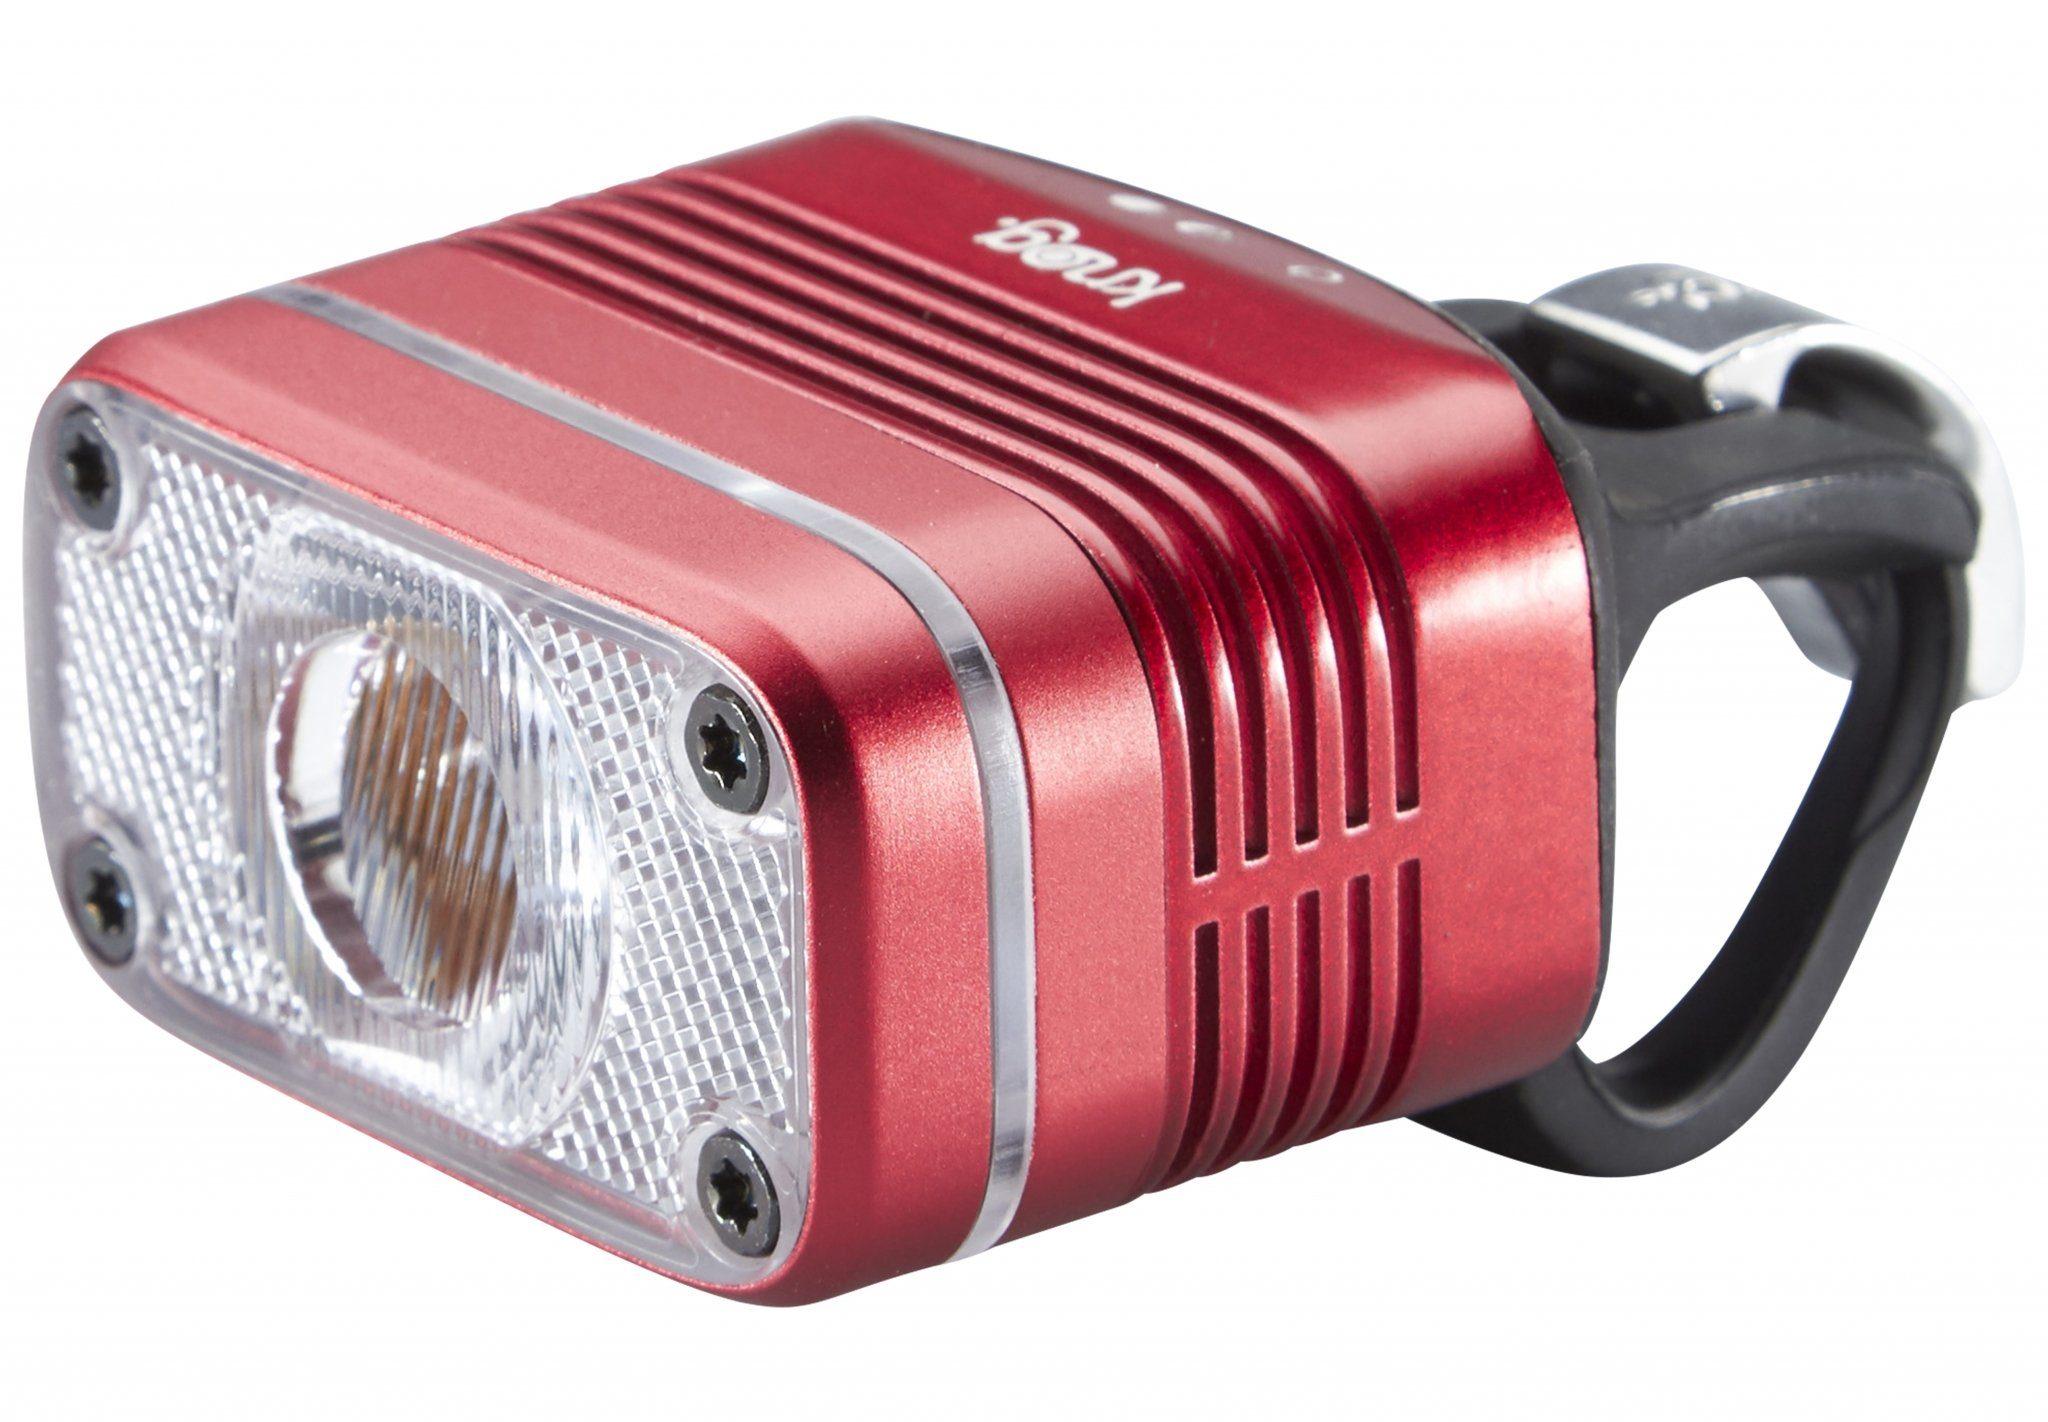 Knog Fahrradbeleuchtung »Knog Blinder Beam 220 Frontlicht StVZO weiße LED«